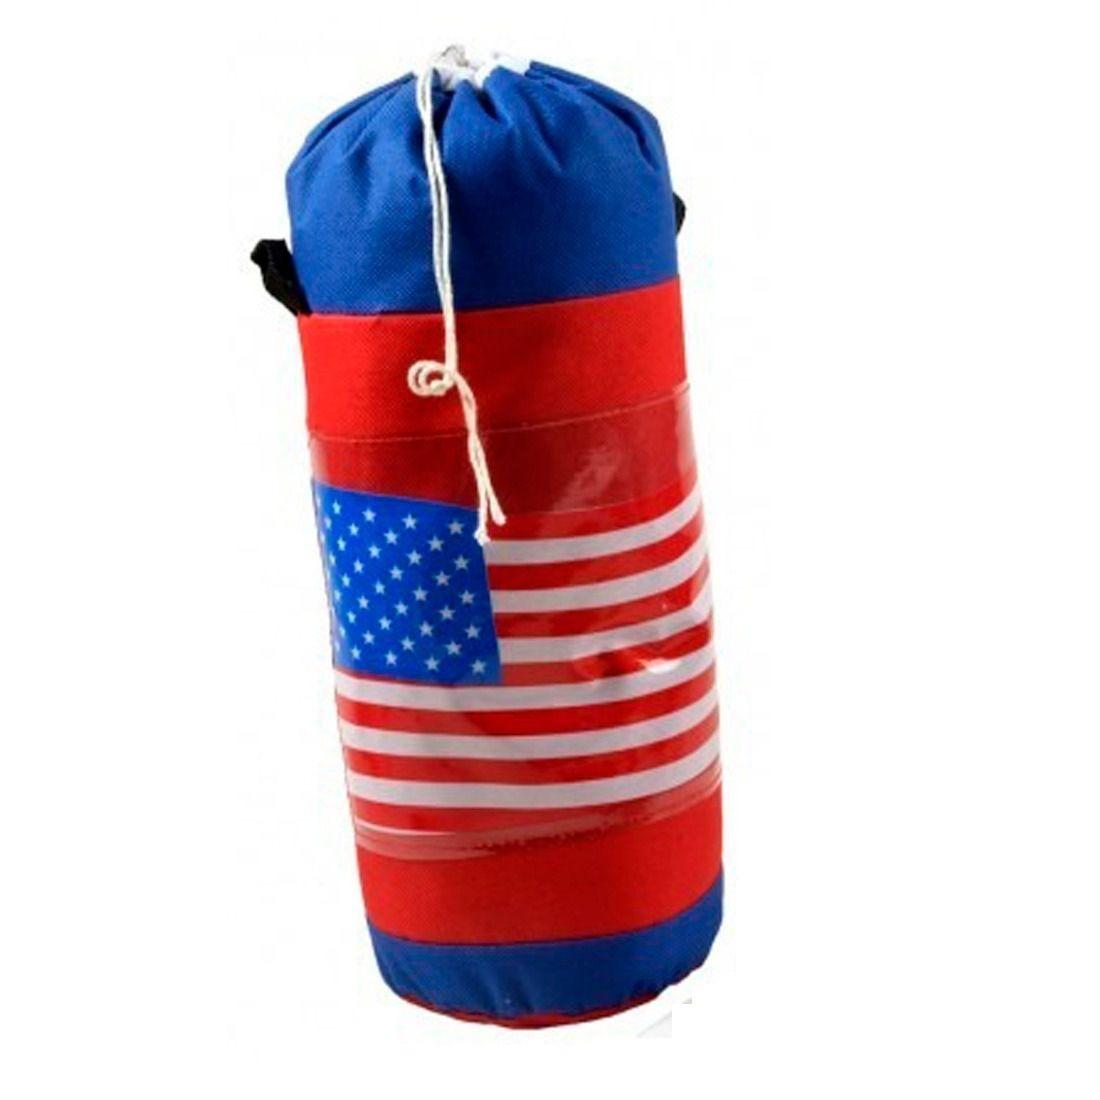 luva saco box infantil eua esportivo atacado boxe presente. Carregando zoom. 249d72d78ec8b